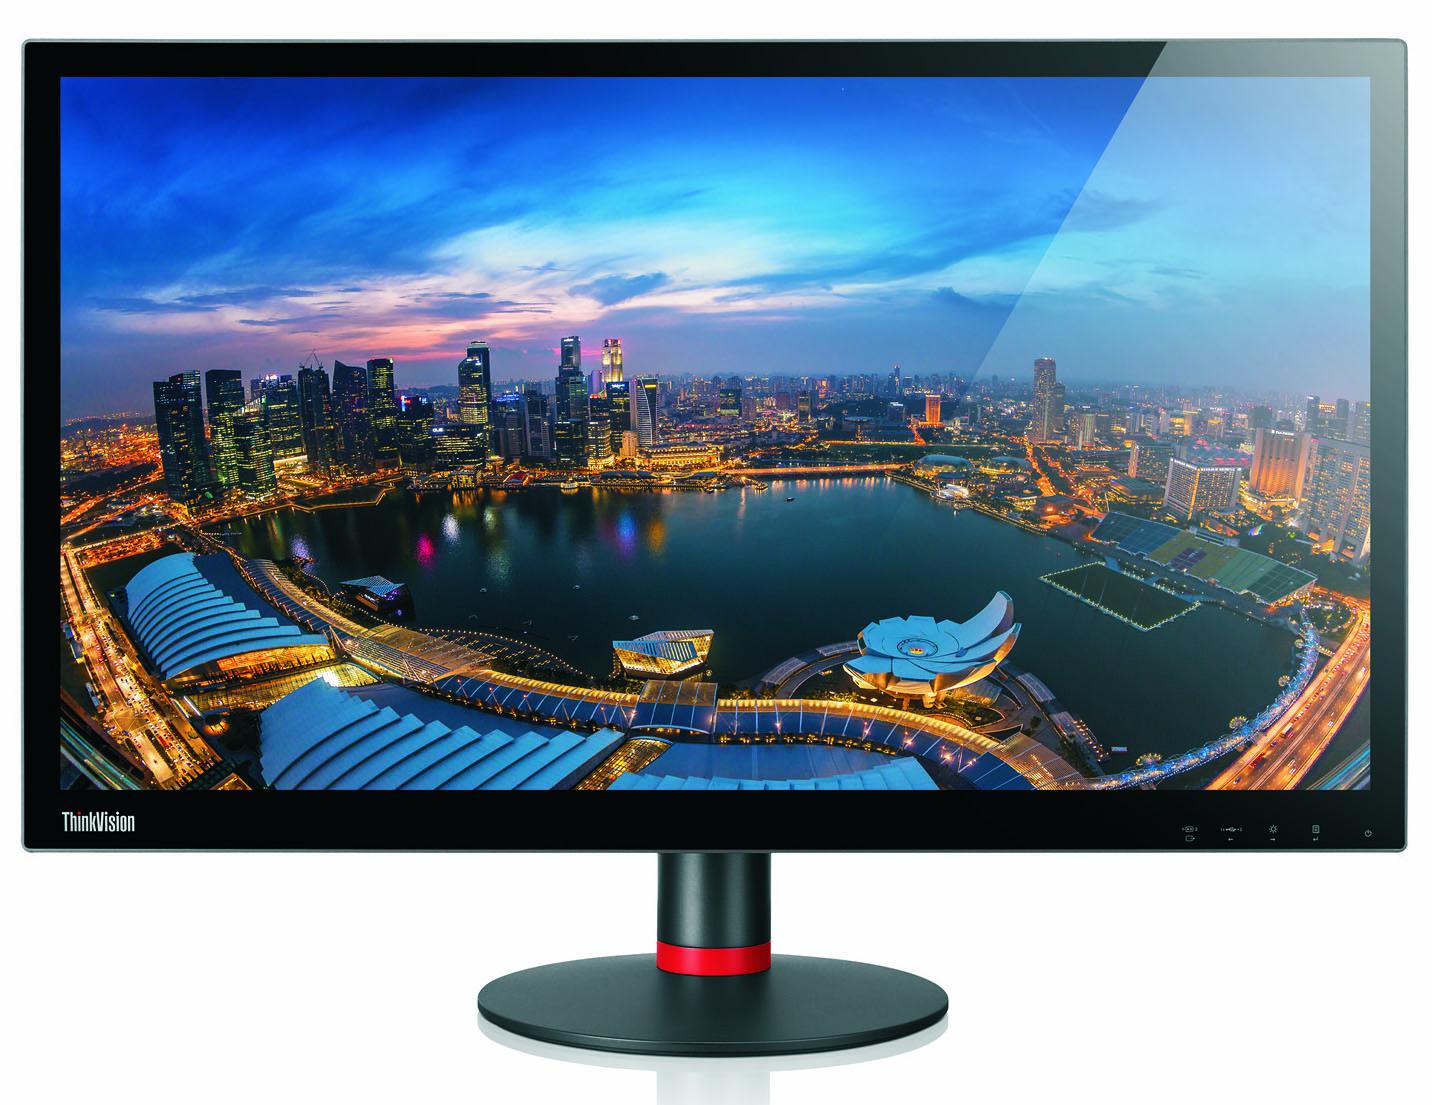 Monitor 4K - Lenovo ThinkVision Pro2840m